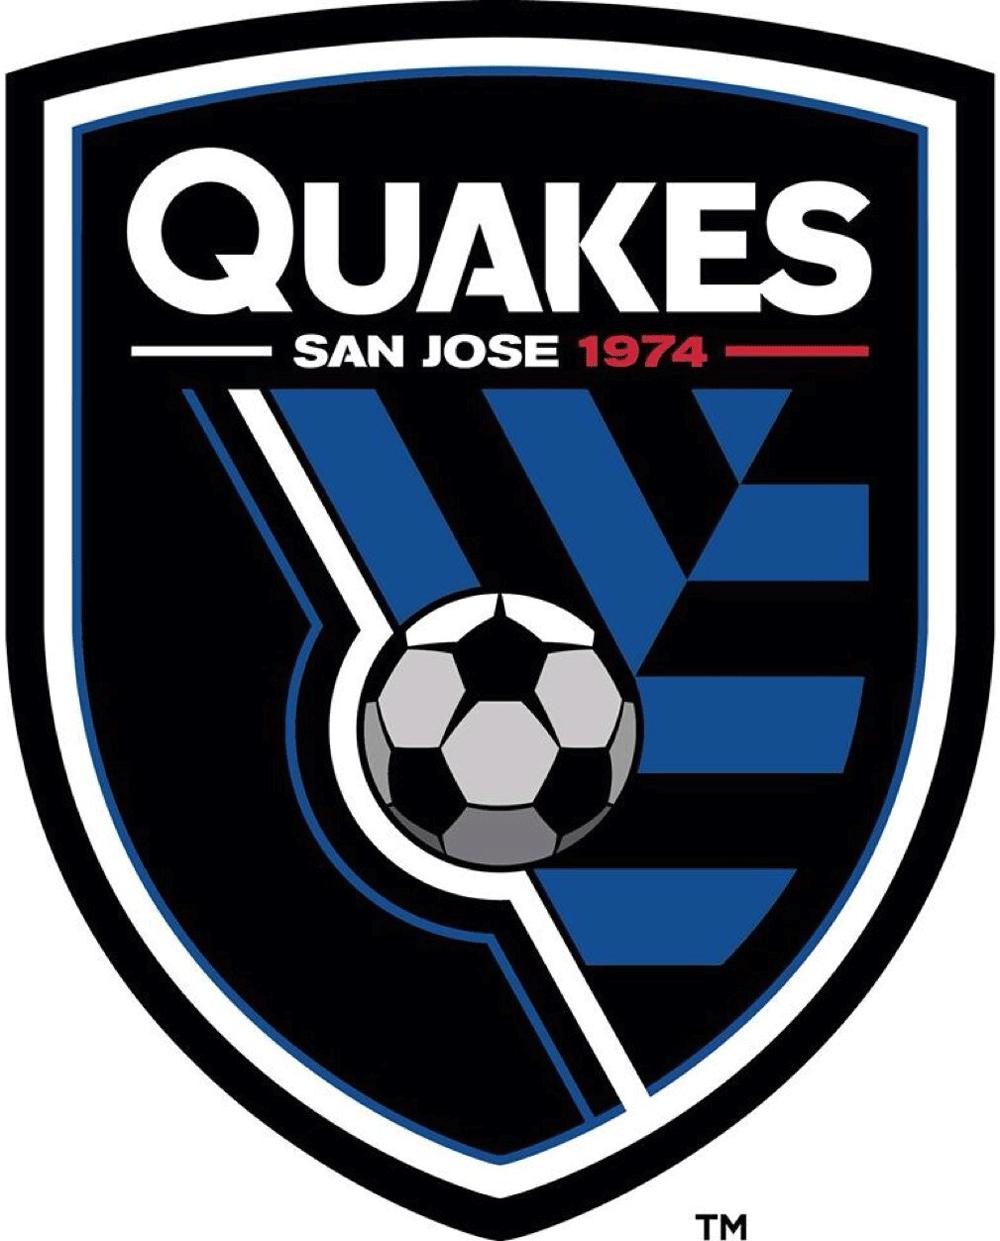 Terkuak! Profil Klub Sepakbola San Jose Earthquakes Bikin Merinding